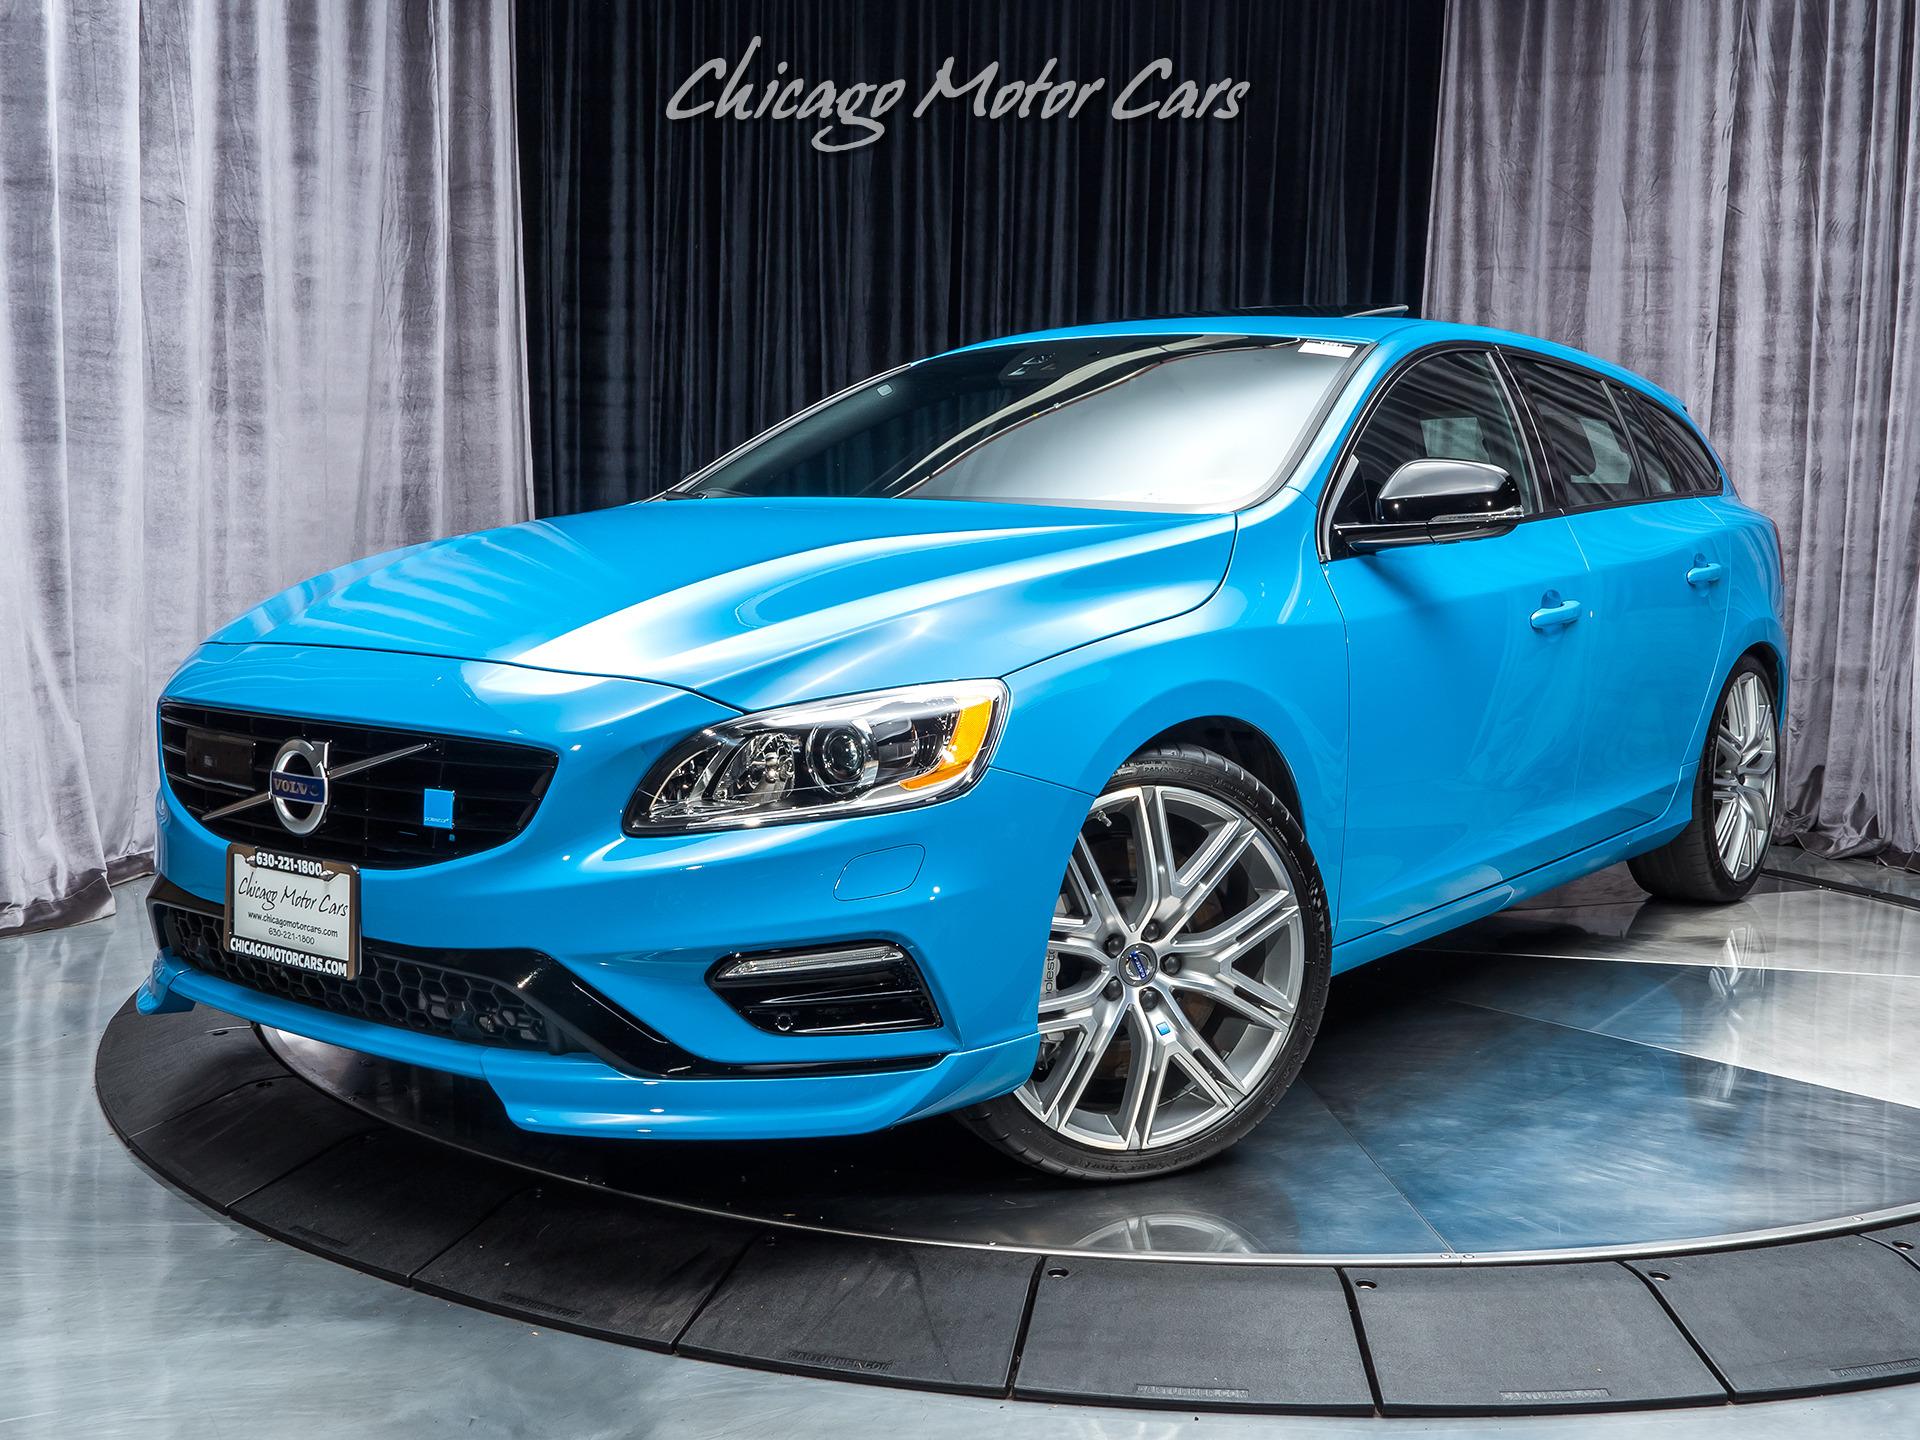 2017 Volvo V60 Polestar Awd Chicago Motor Cars Inc Official Corporate Website For Chicago Motor Cars